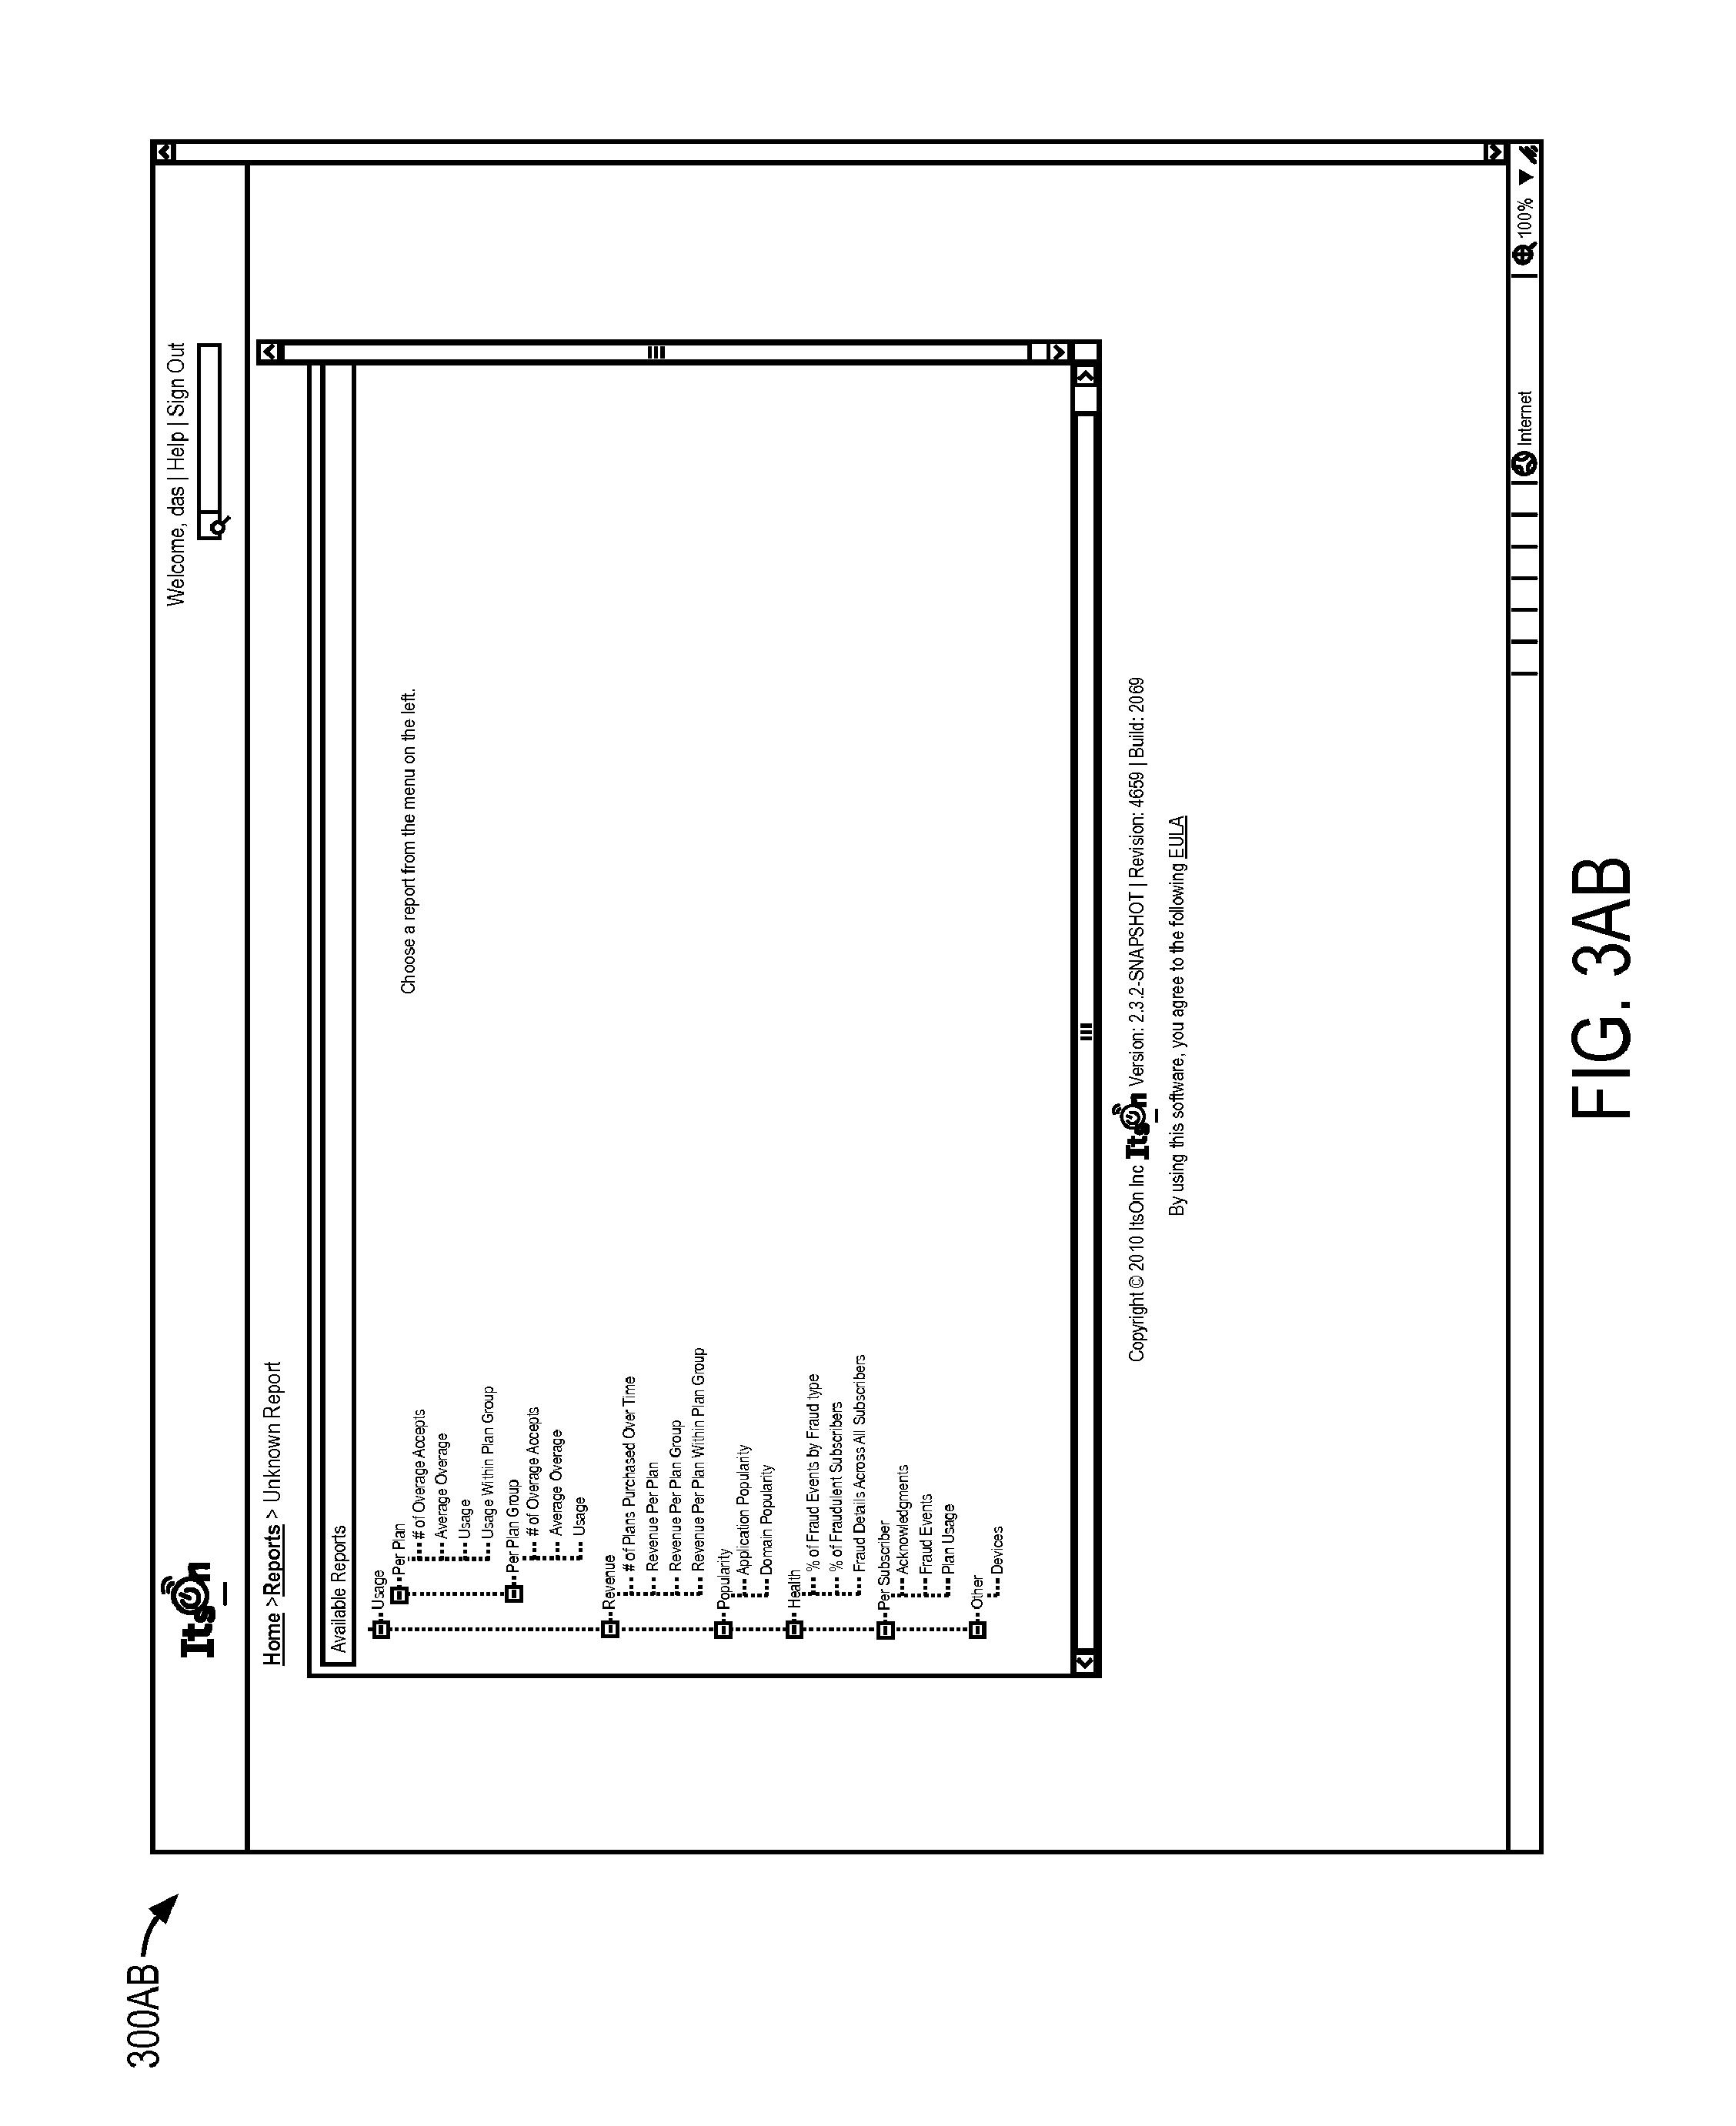 Patent US 9,706,061 B2